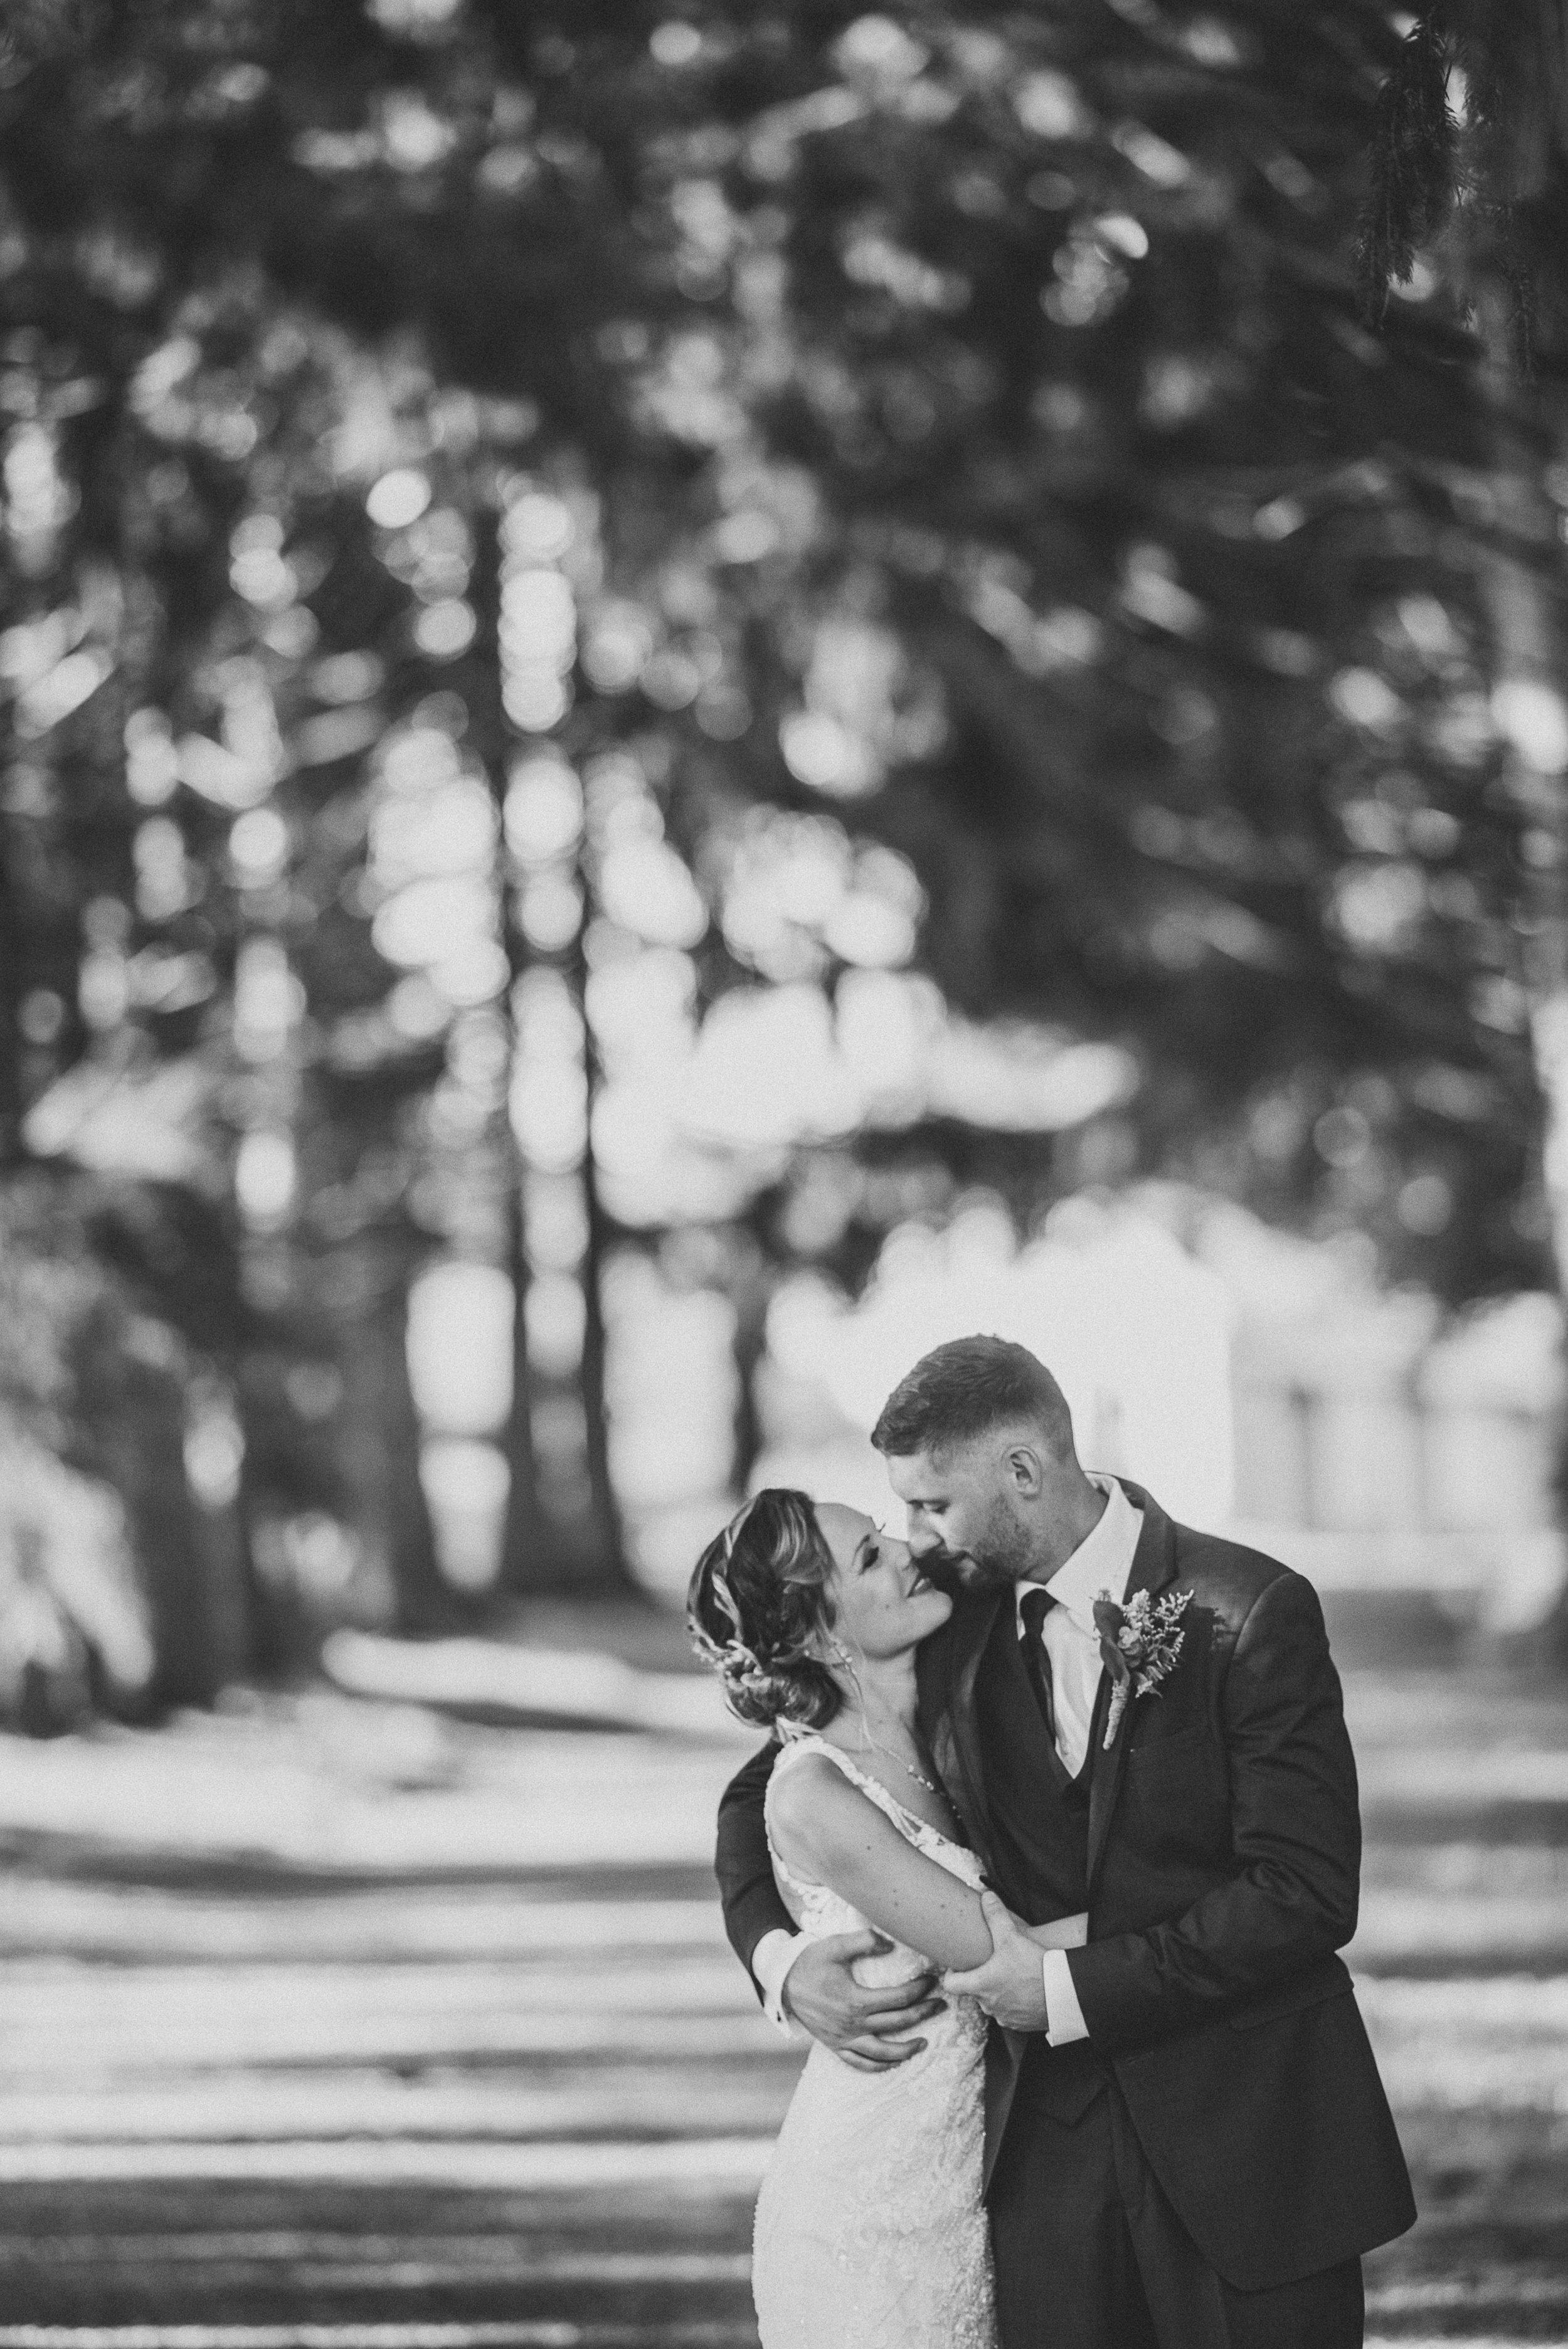 085ninalilyphoto-groveatkemptonwedding-hicksblog.jpg